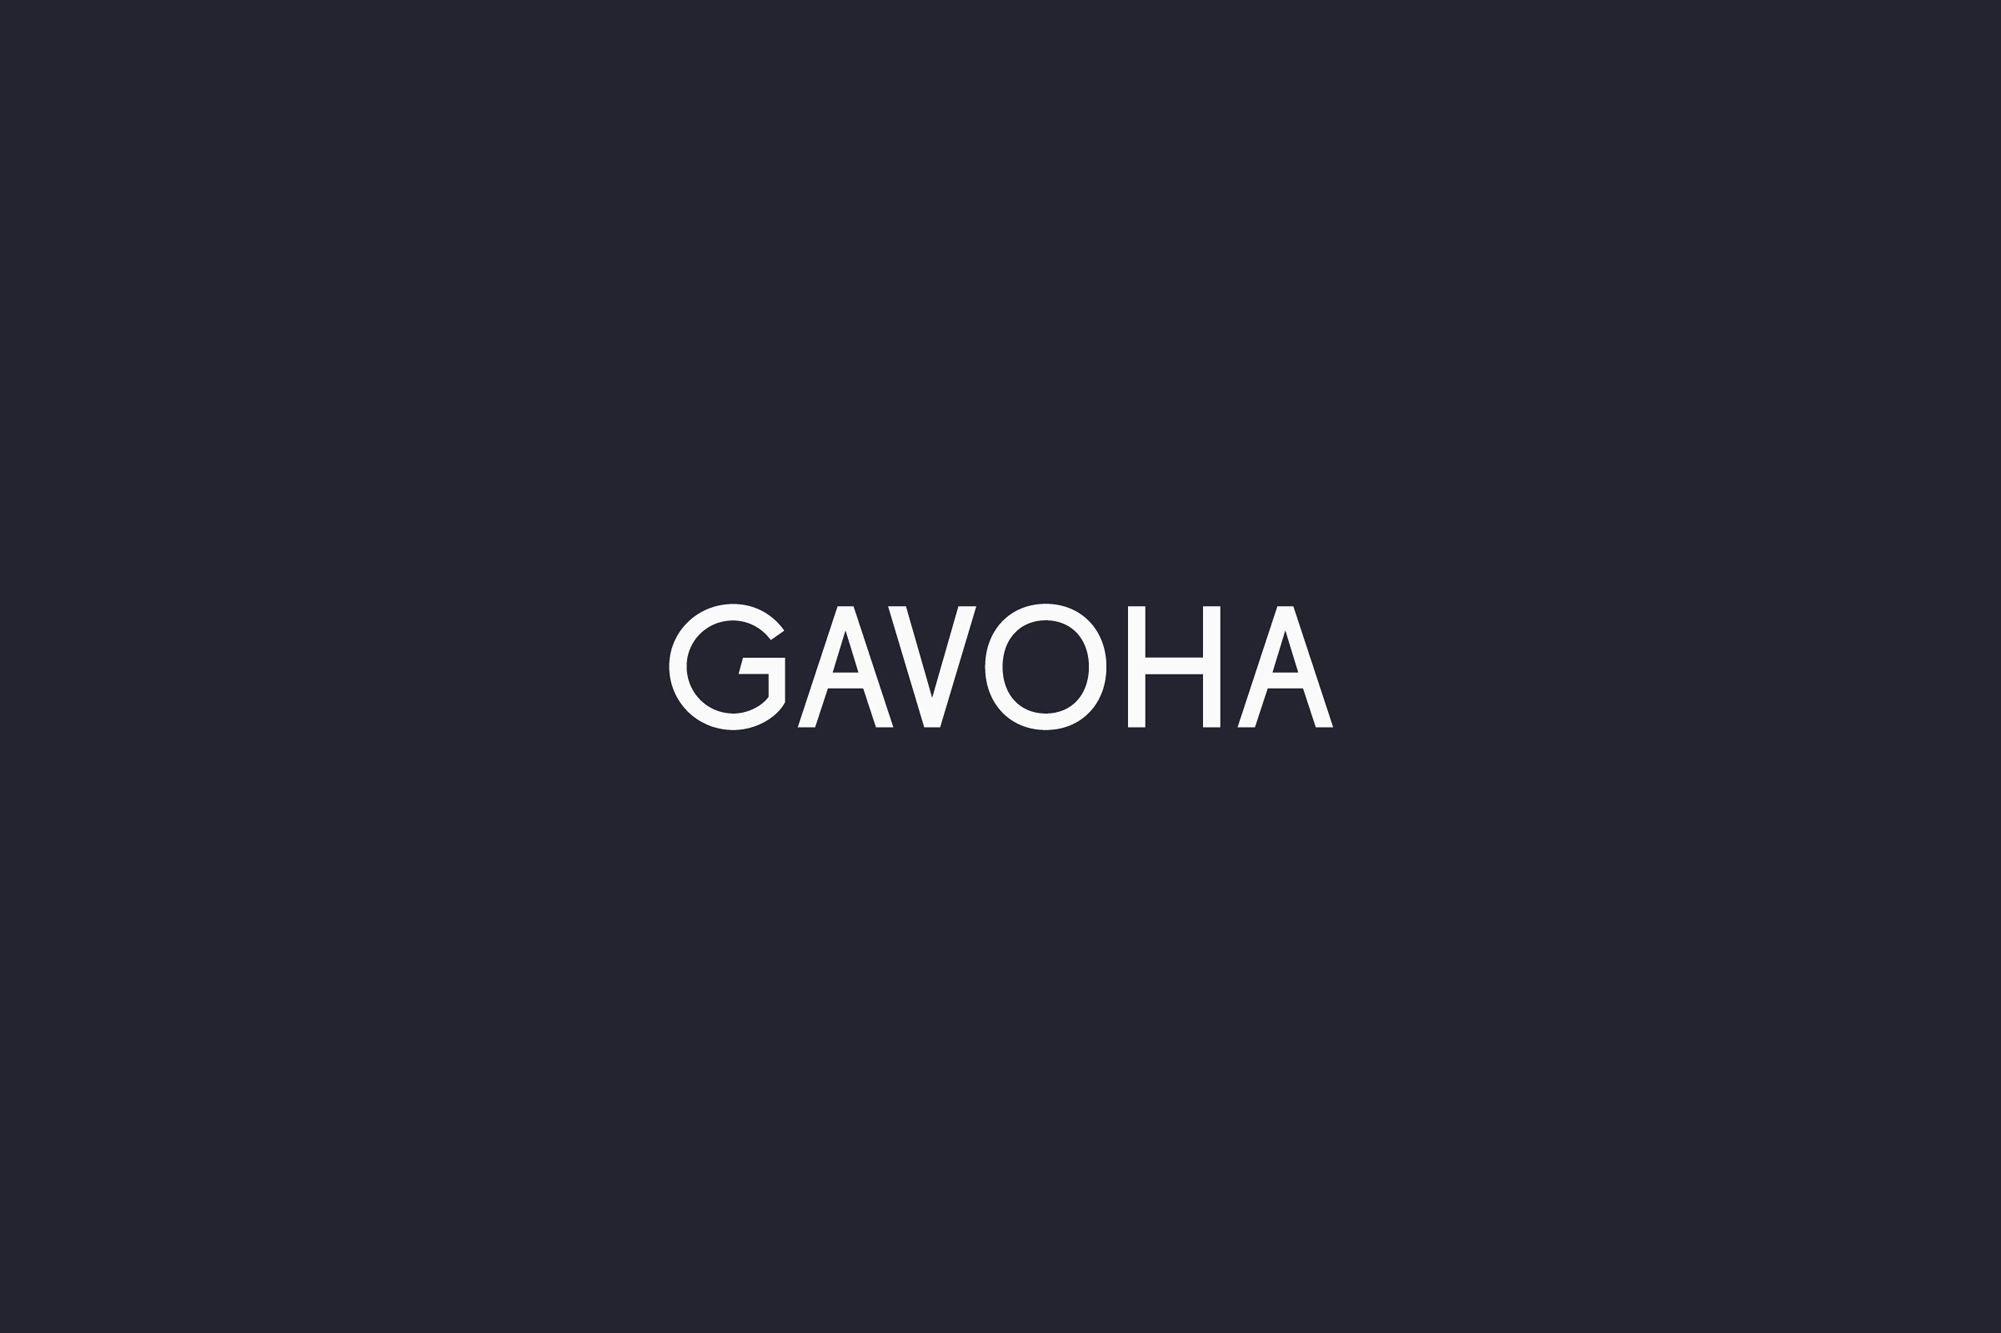 Gavoha